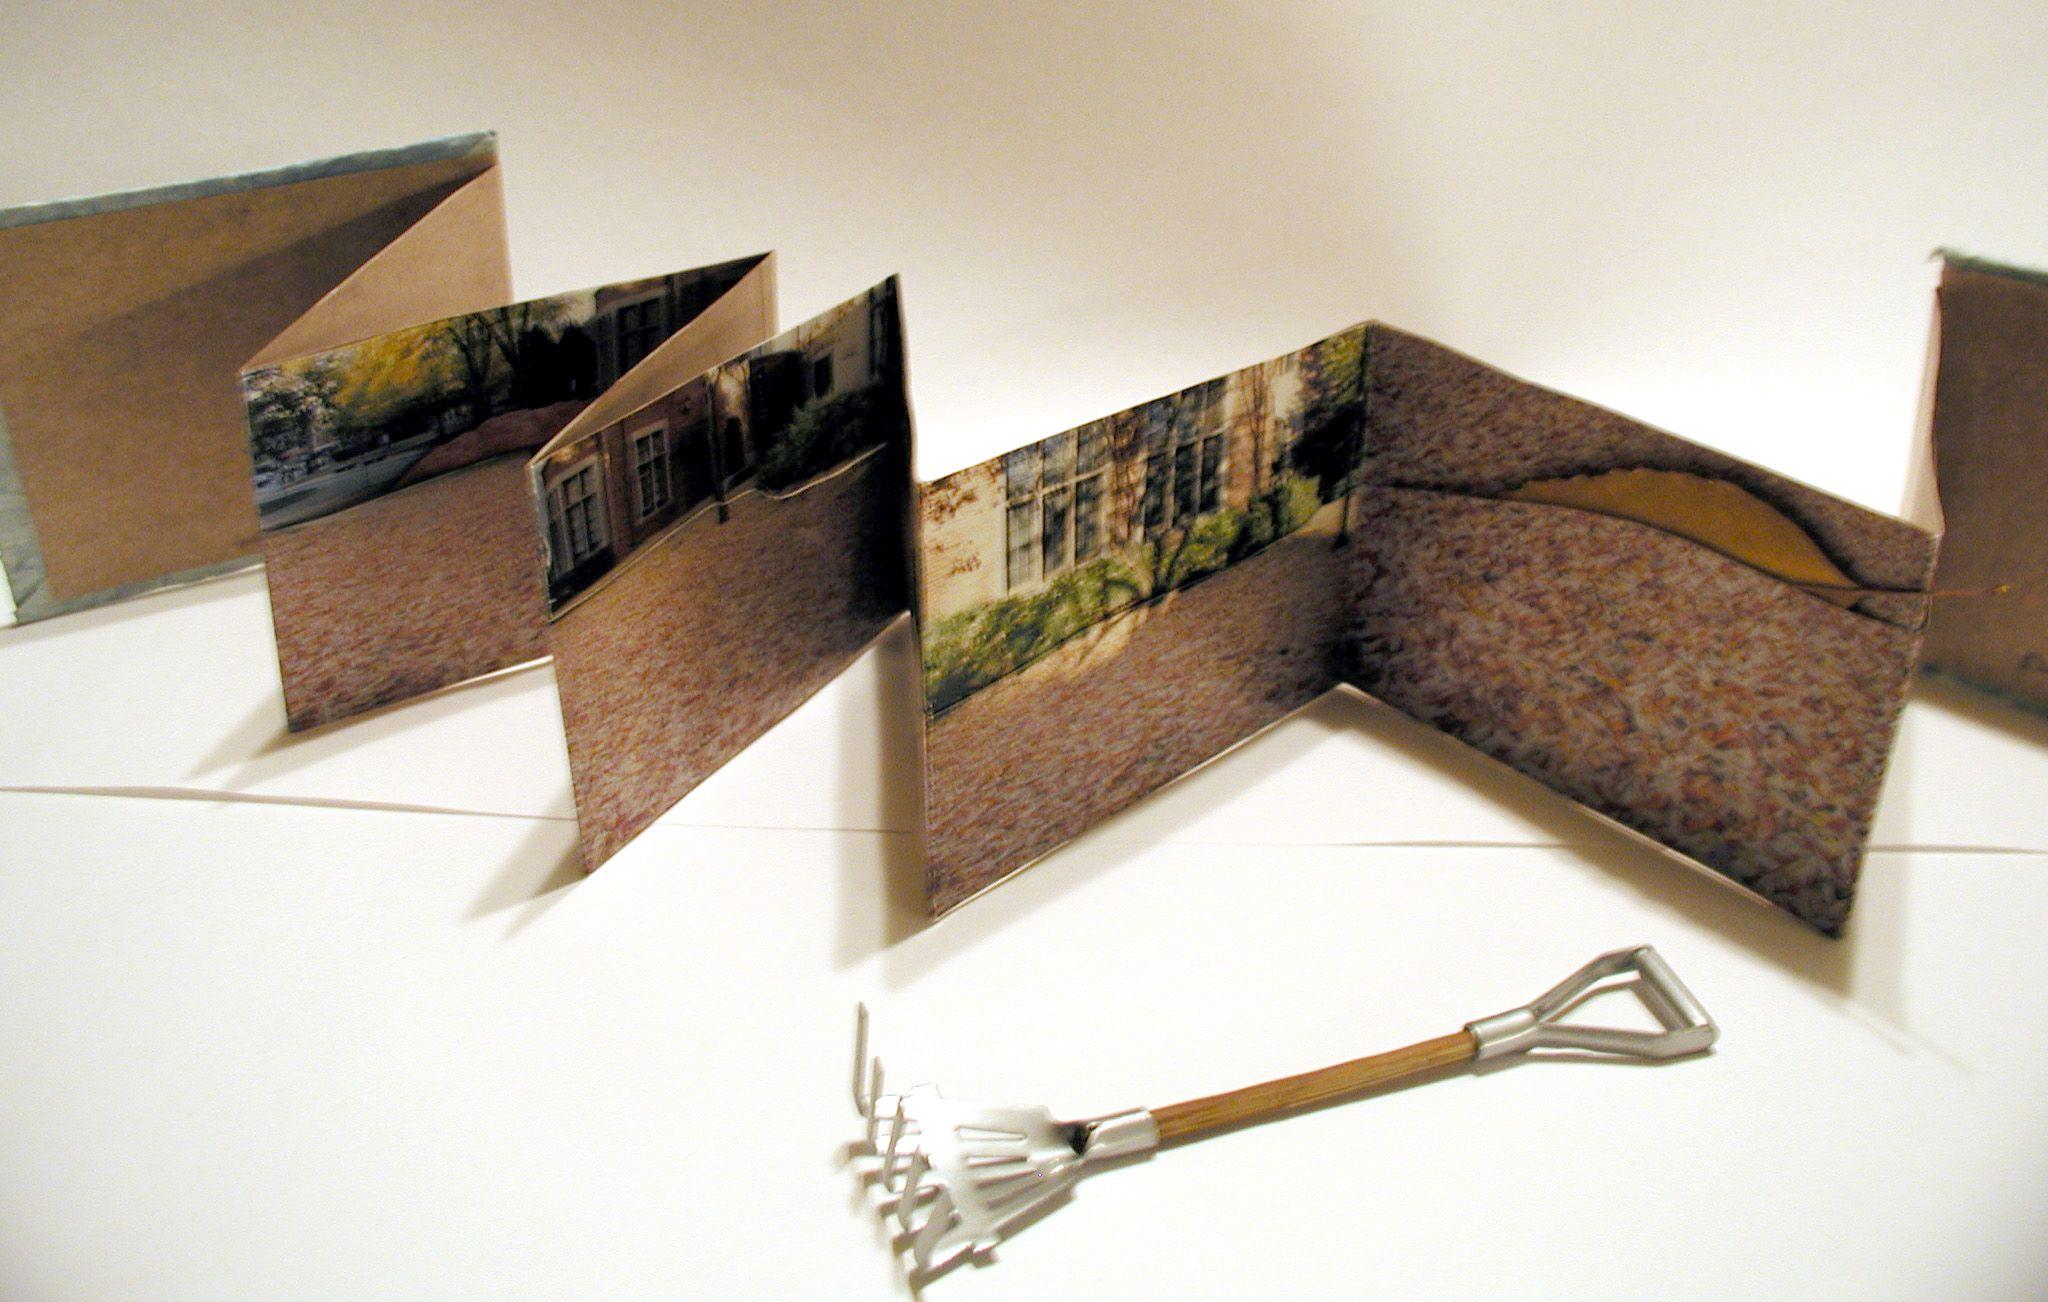 Leaf A Pocket Accordion Book Of Photos Shot At Uw Milwaukee By Darlene Hagopian Handmade Books Artist Books Concertina Book